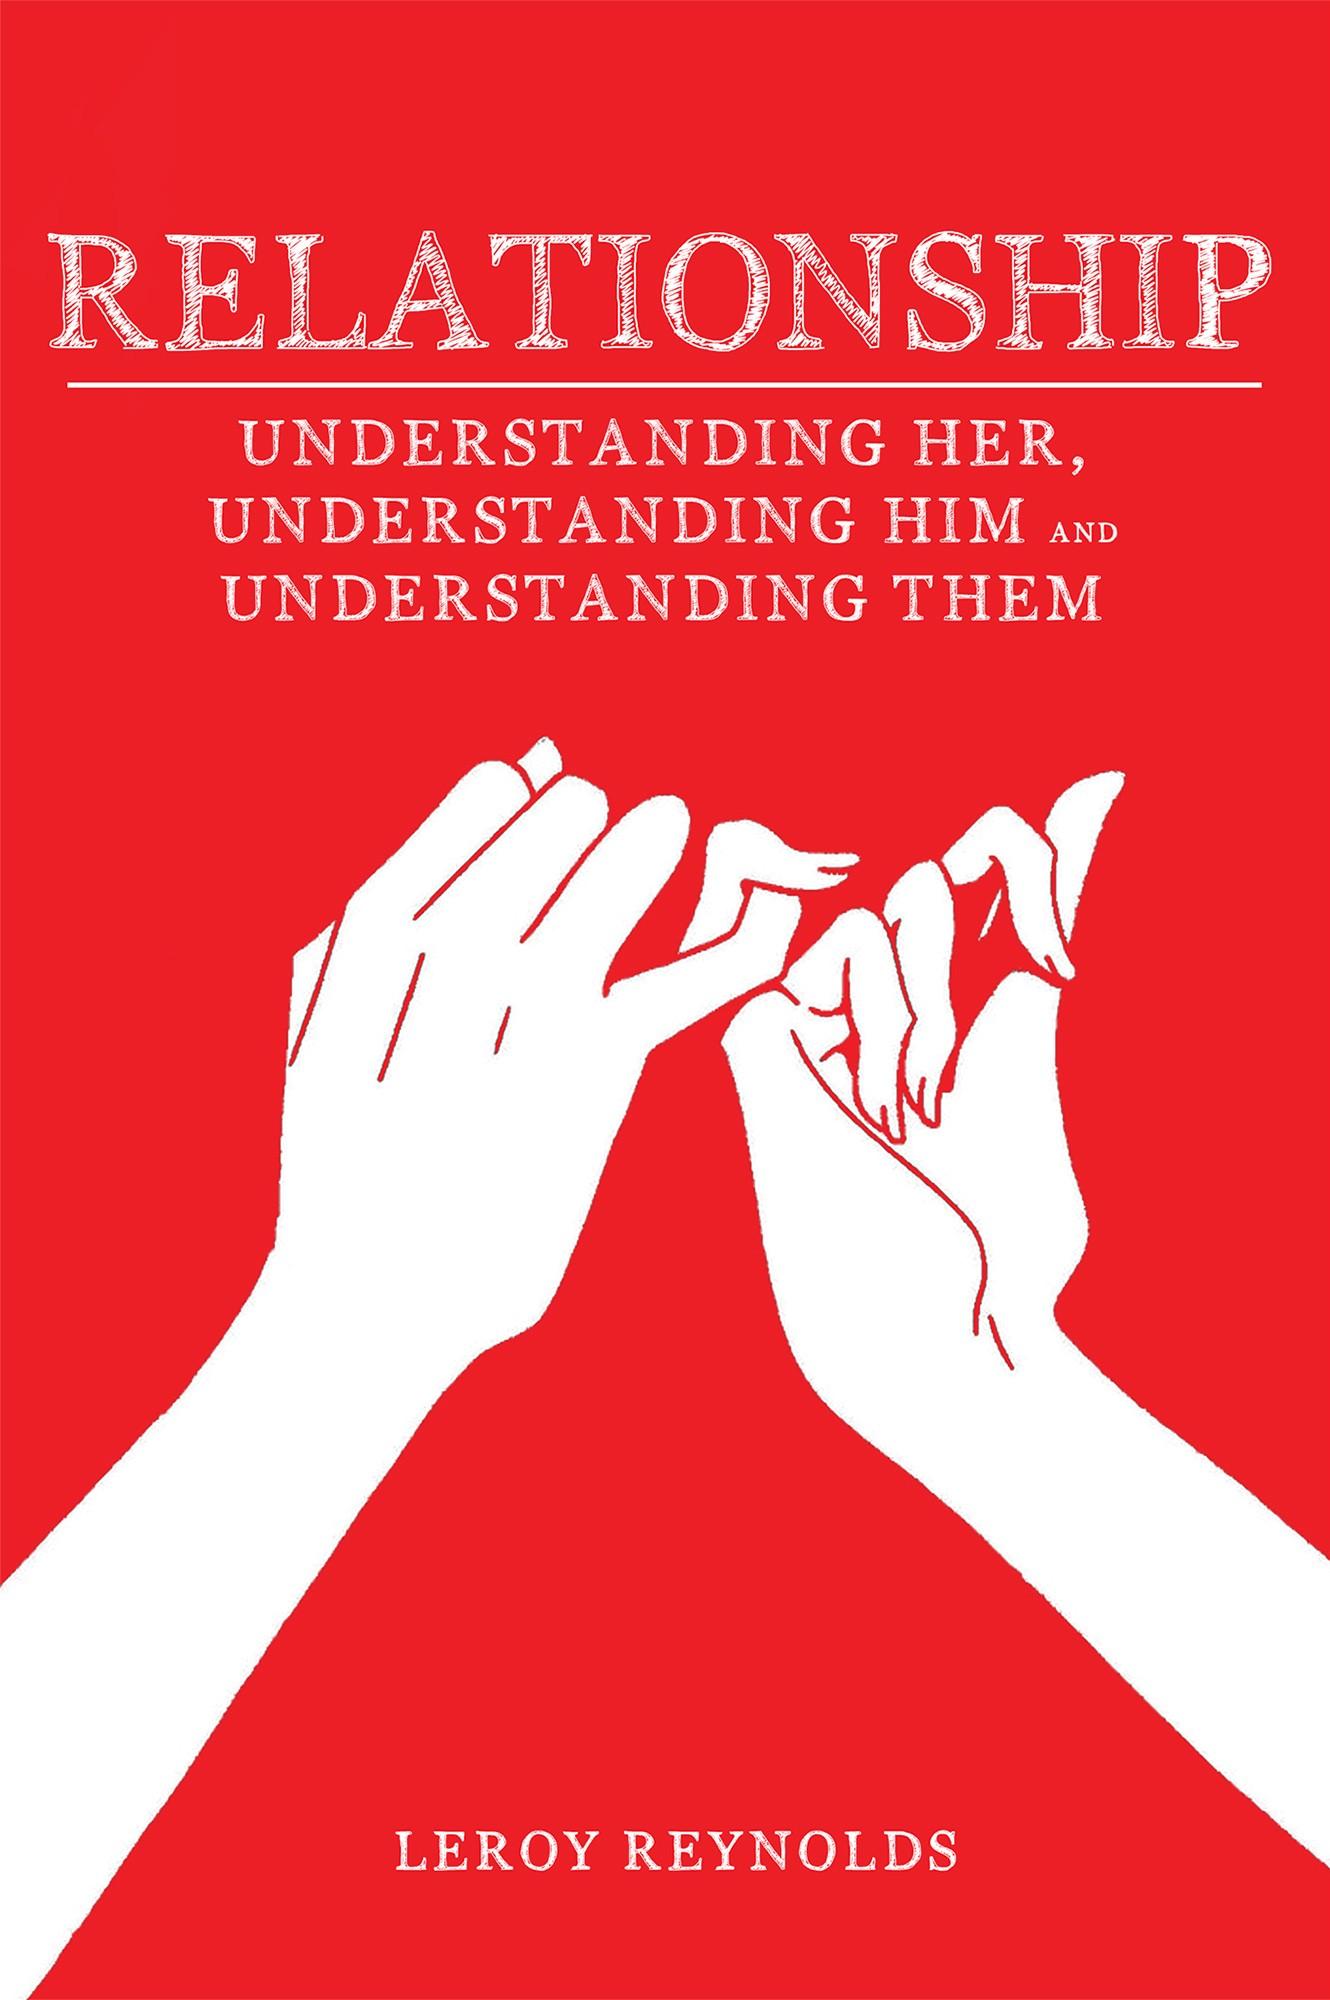 Leroy Reynolds book Relationship Understanding Her the Wife Understanding Him the Husband